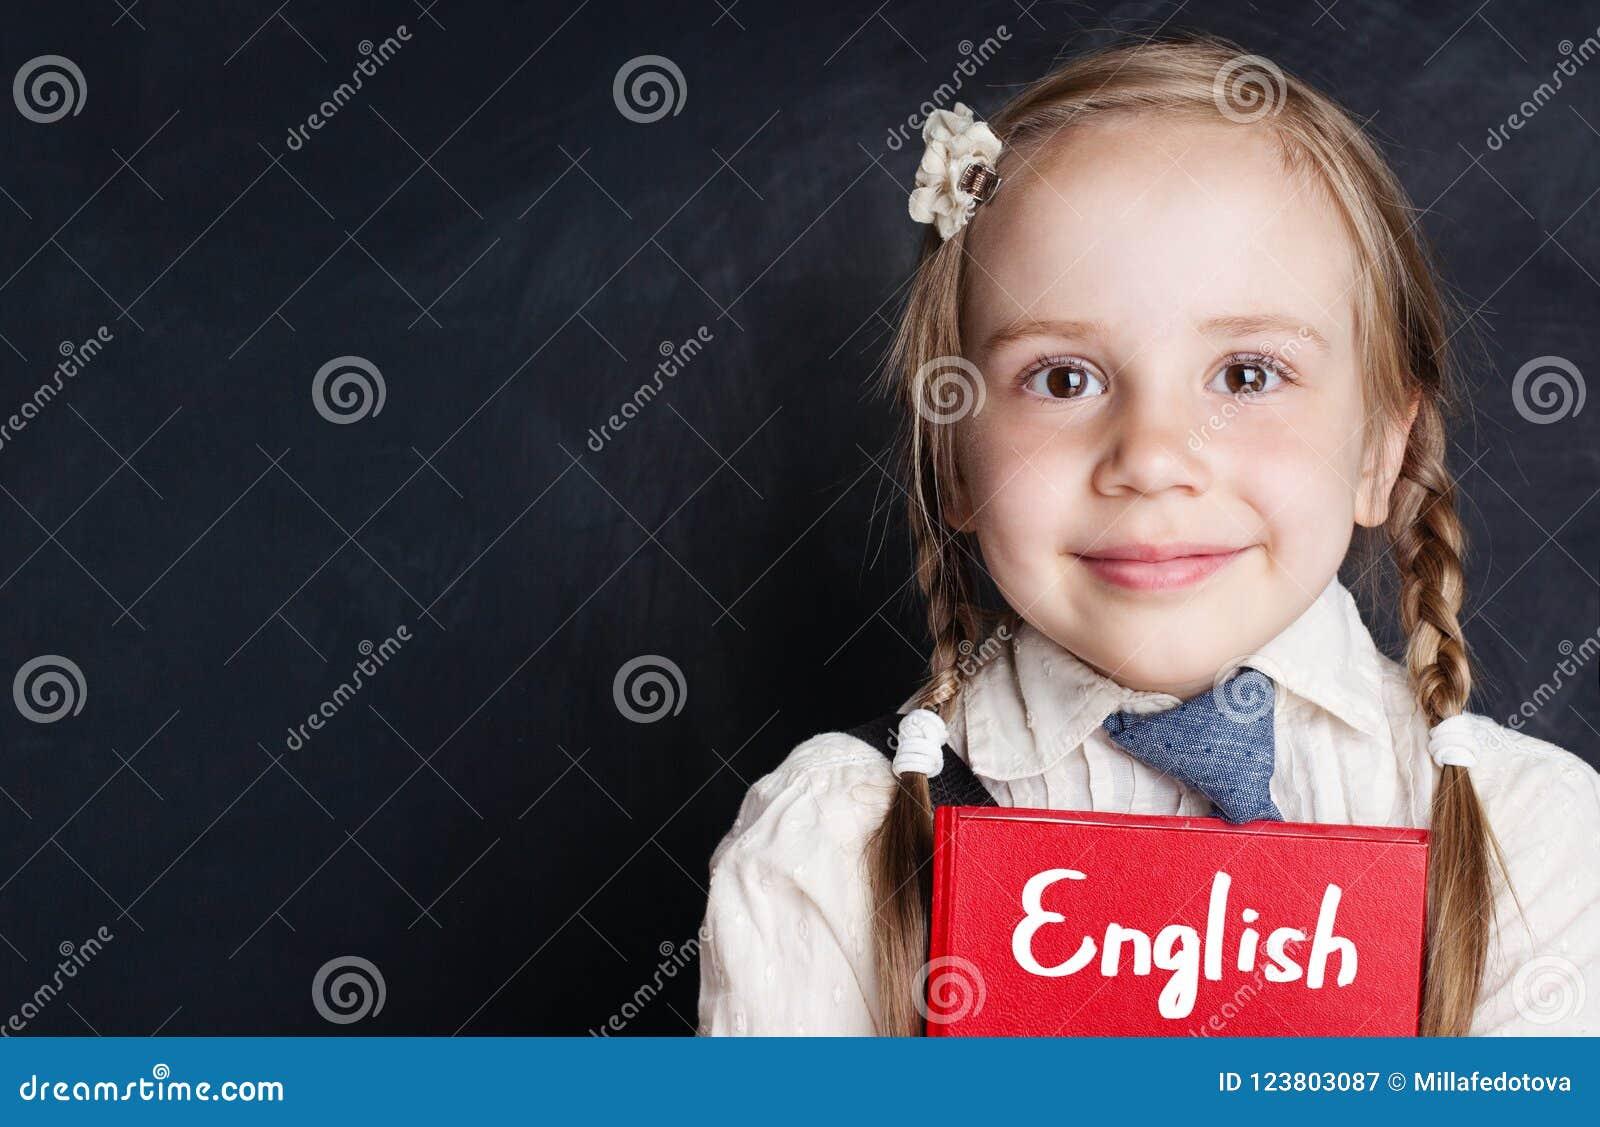 Kids learn english concept. Closeup portrait of cute child girl